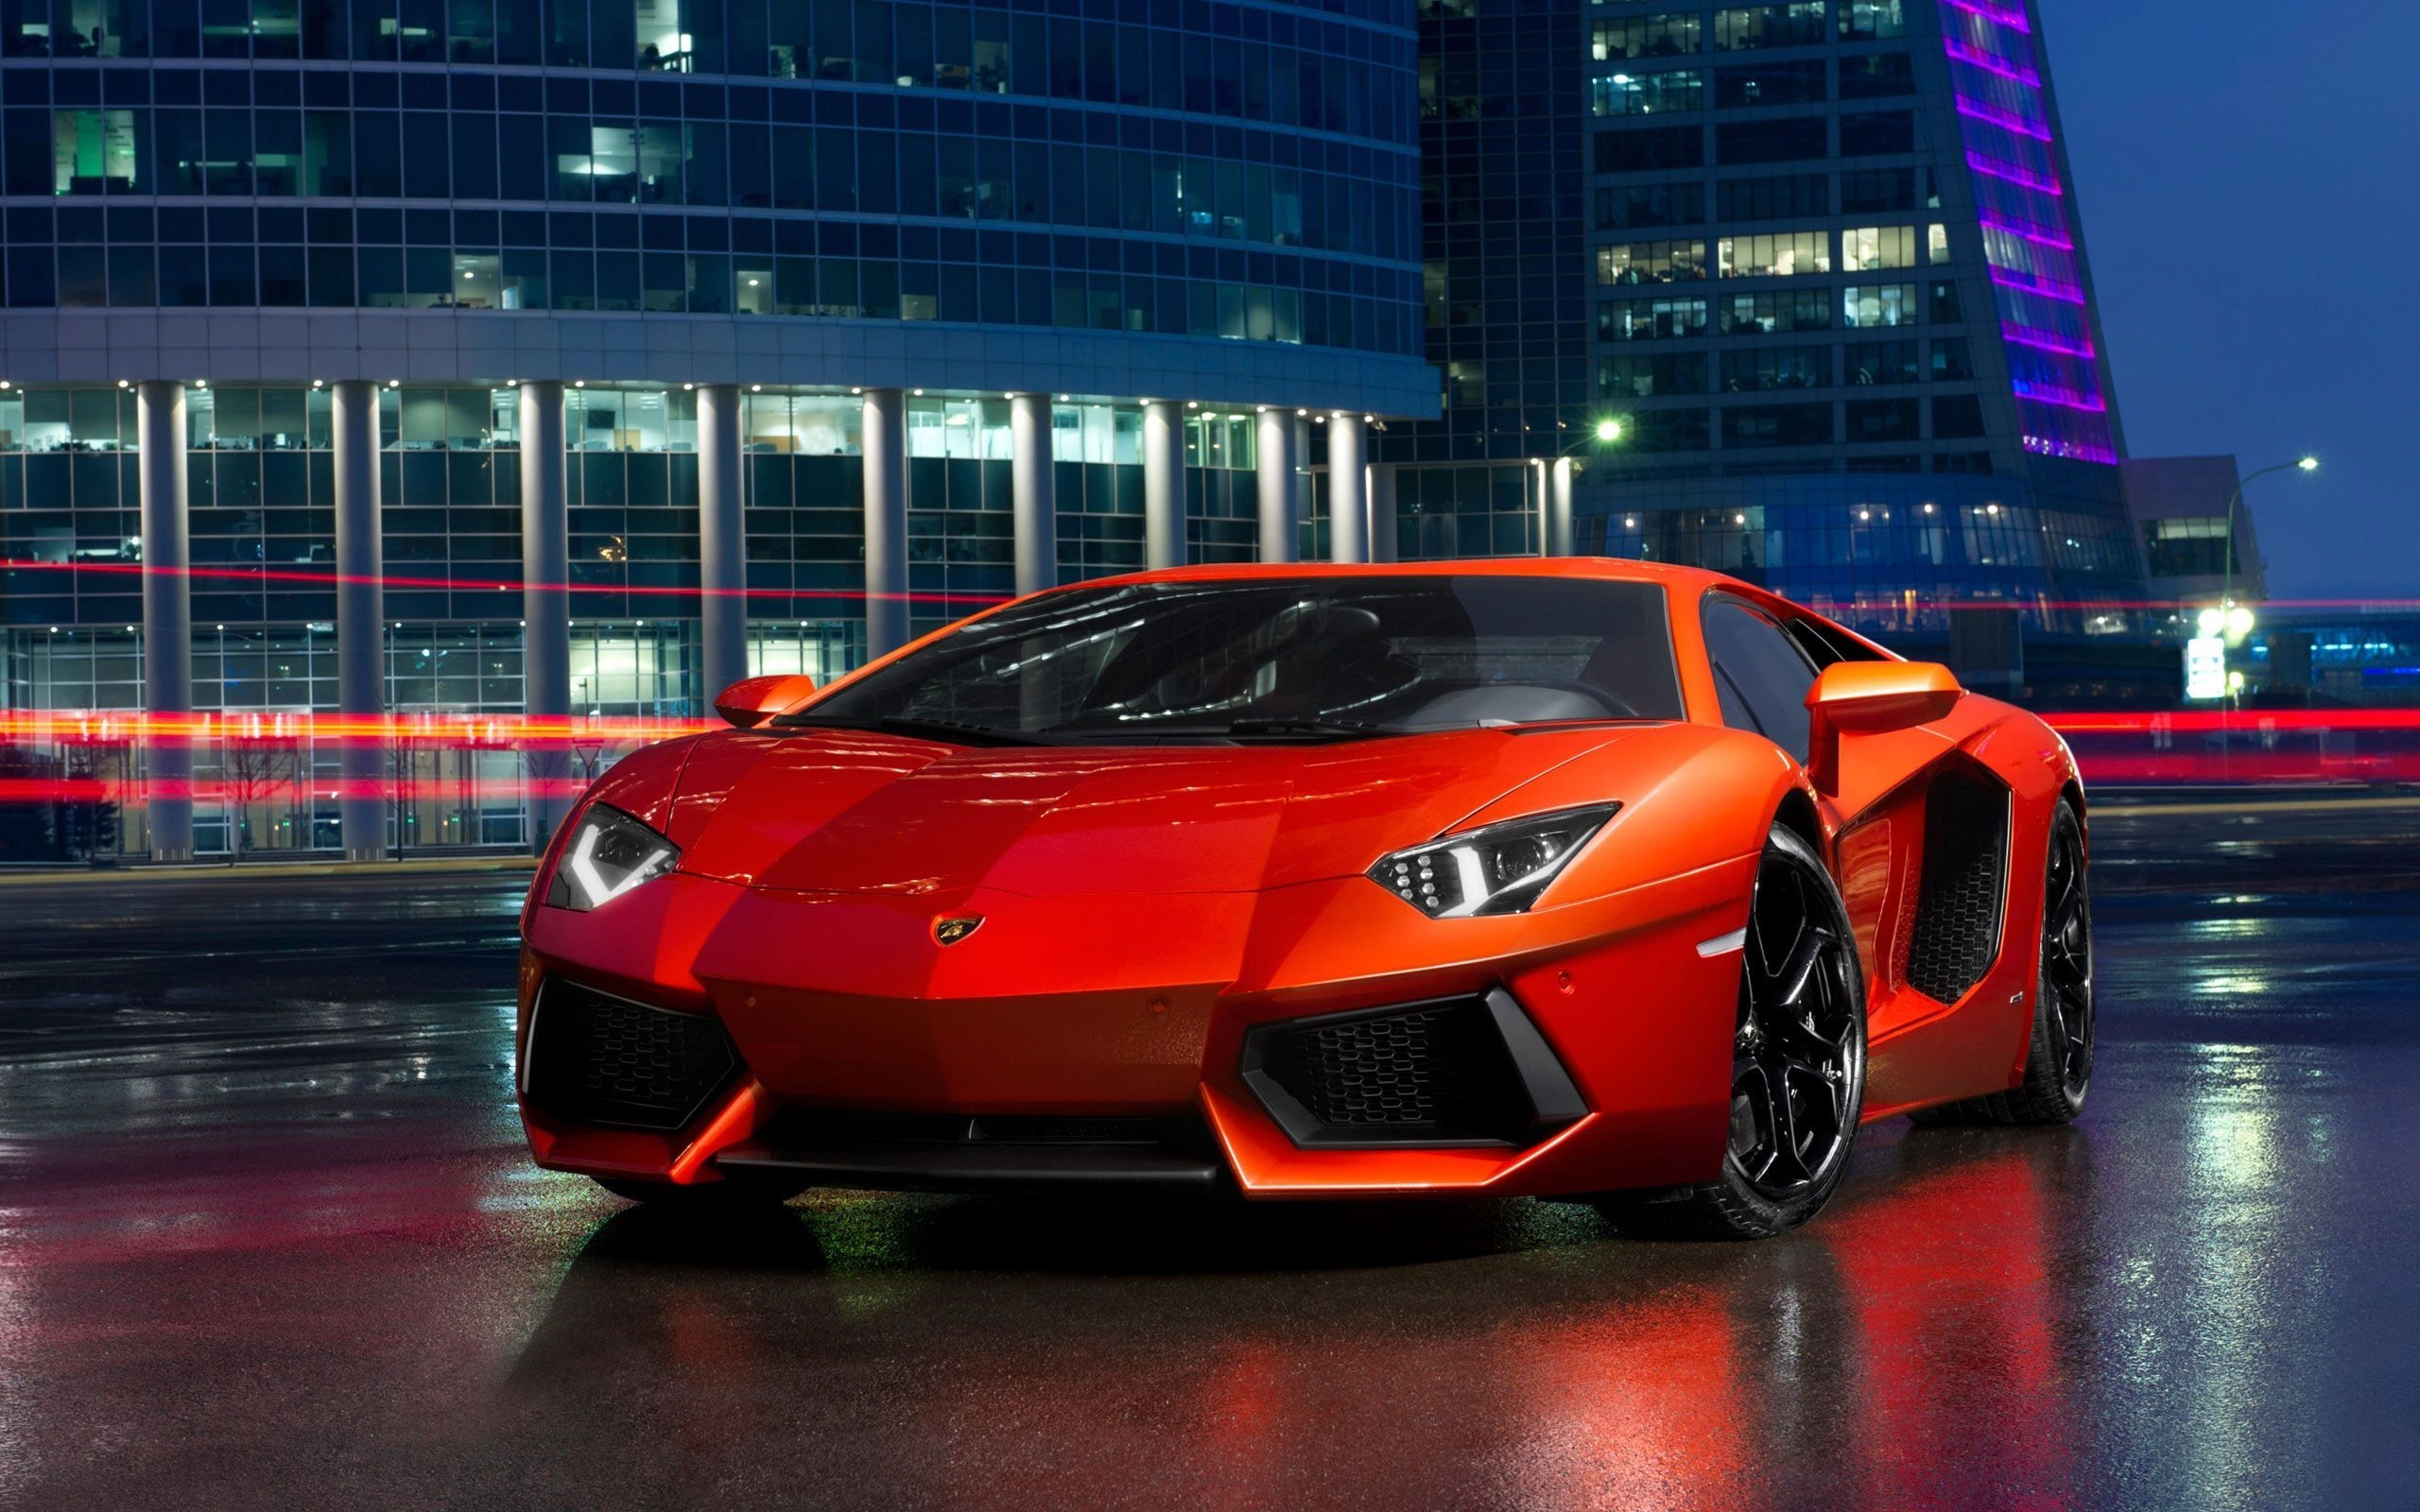 Lamborghini UHD Wallpapers